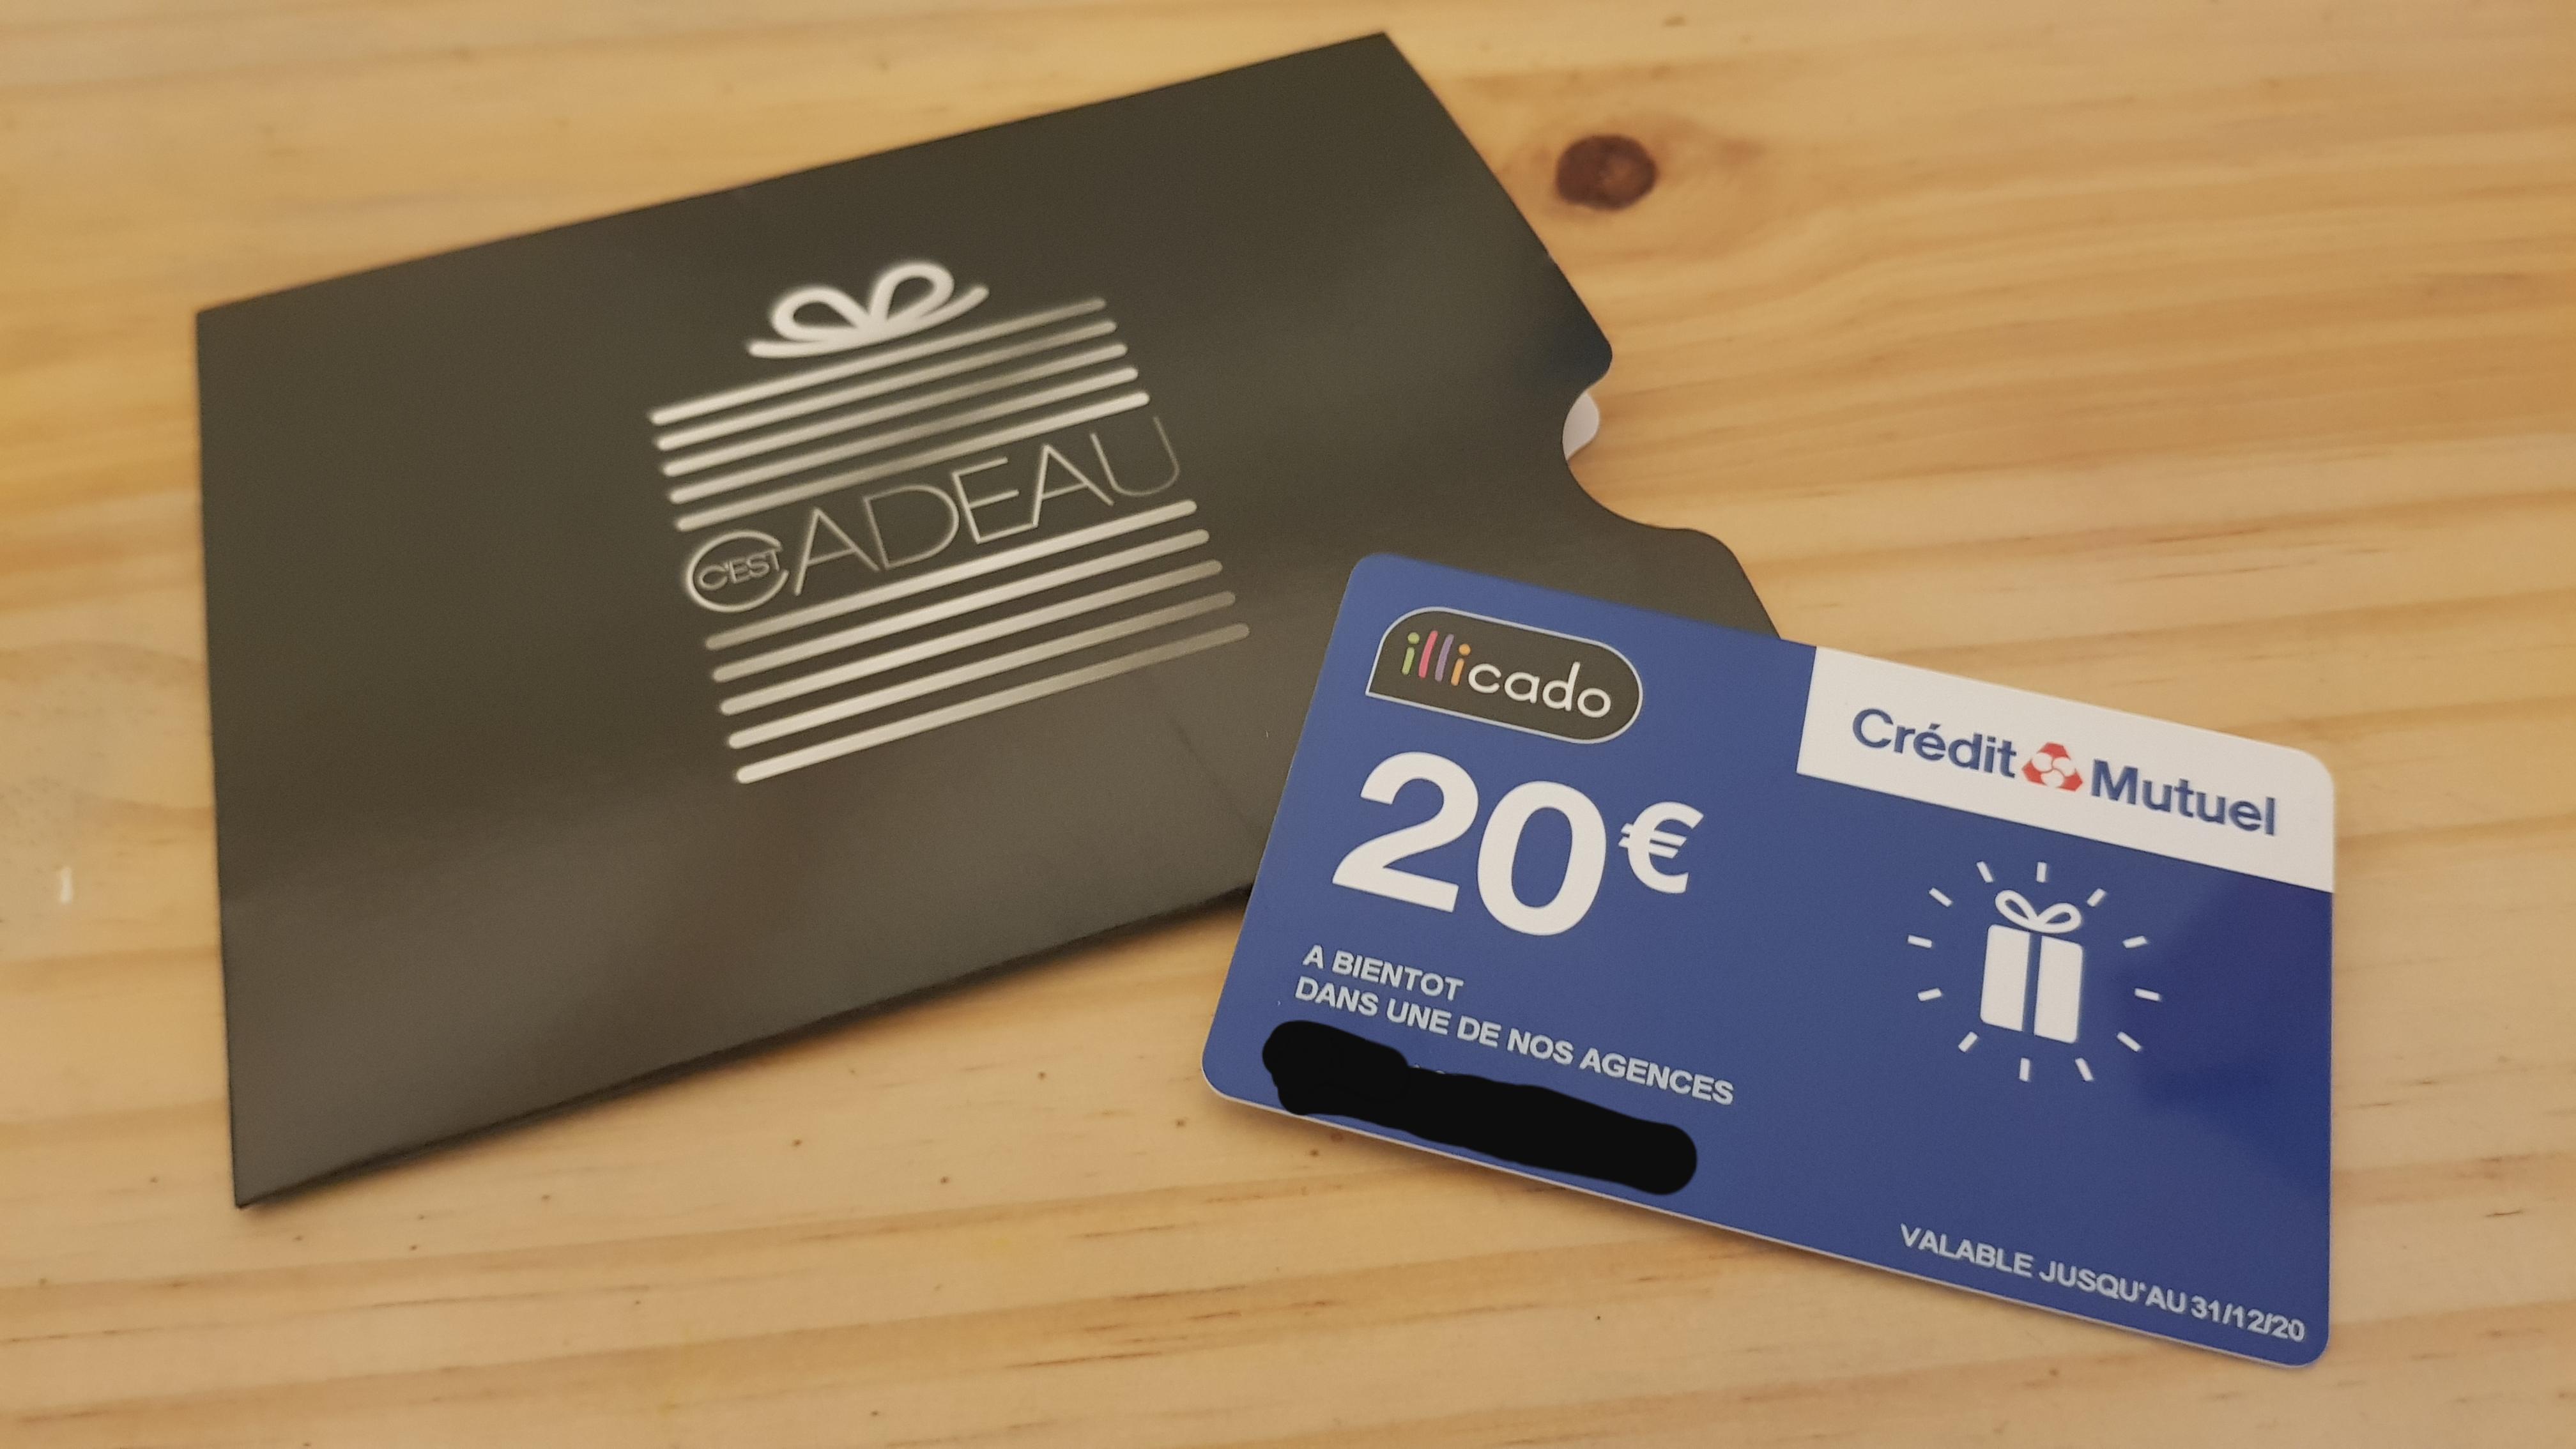 Carte Illicado Magasin But.20 Offerts En Carte Illicado 100 Gagnant Credit Mutuel